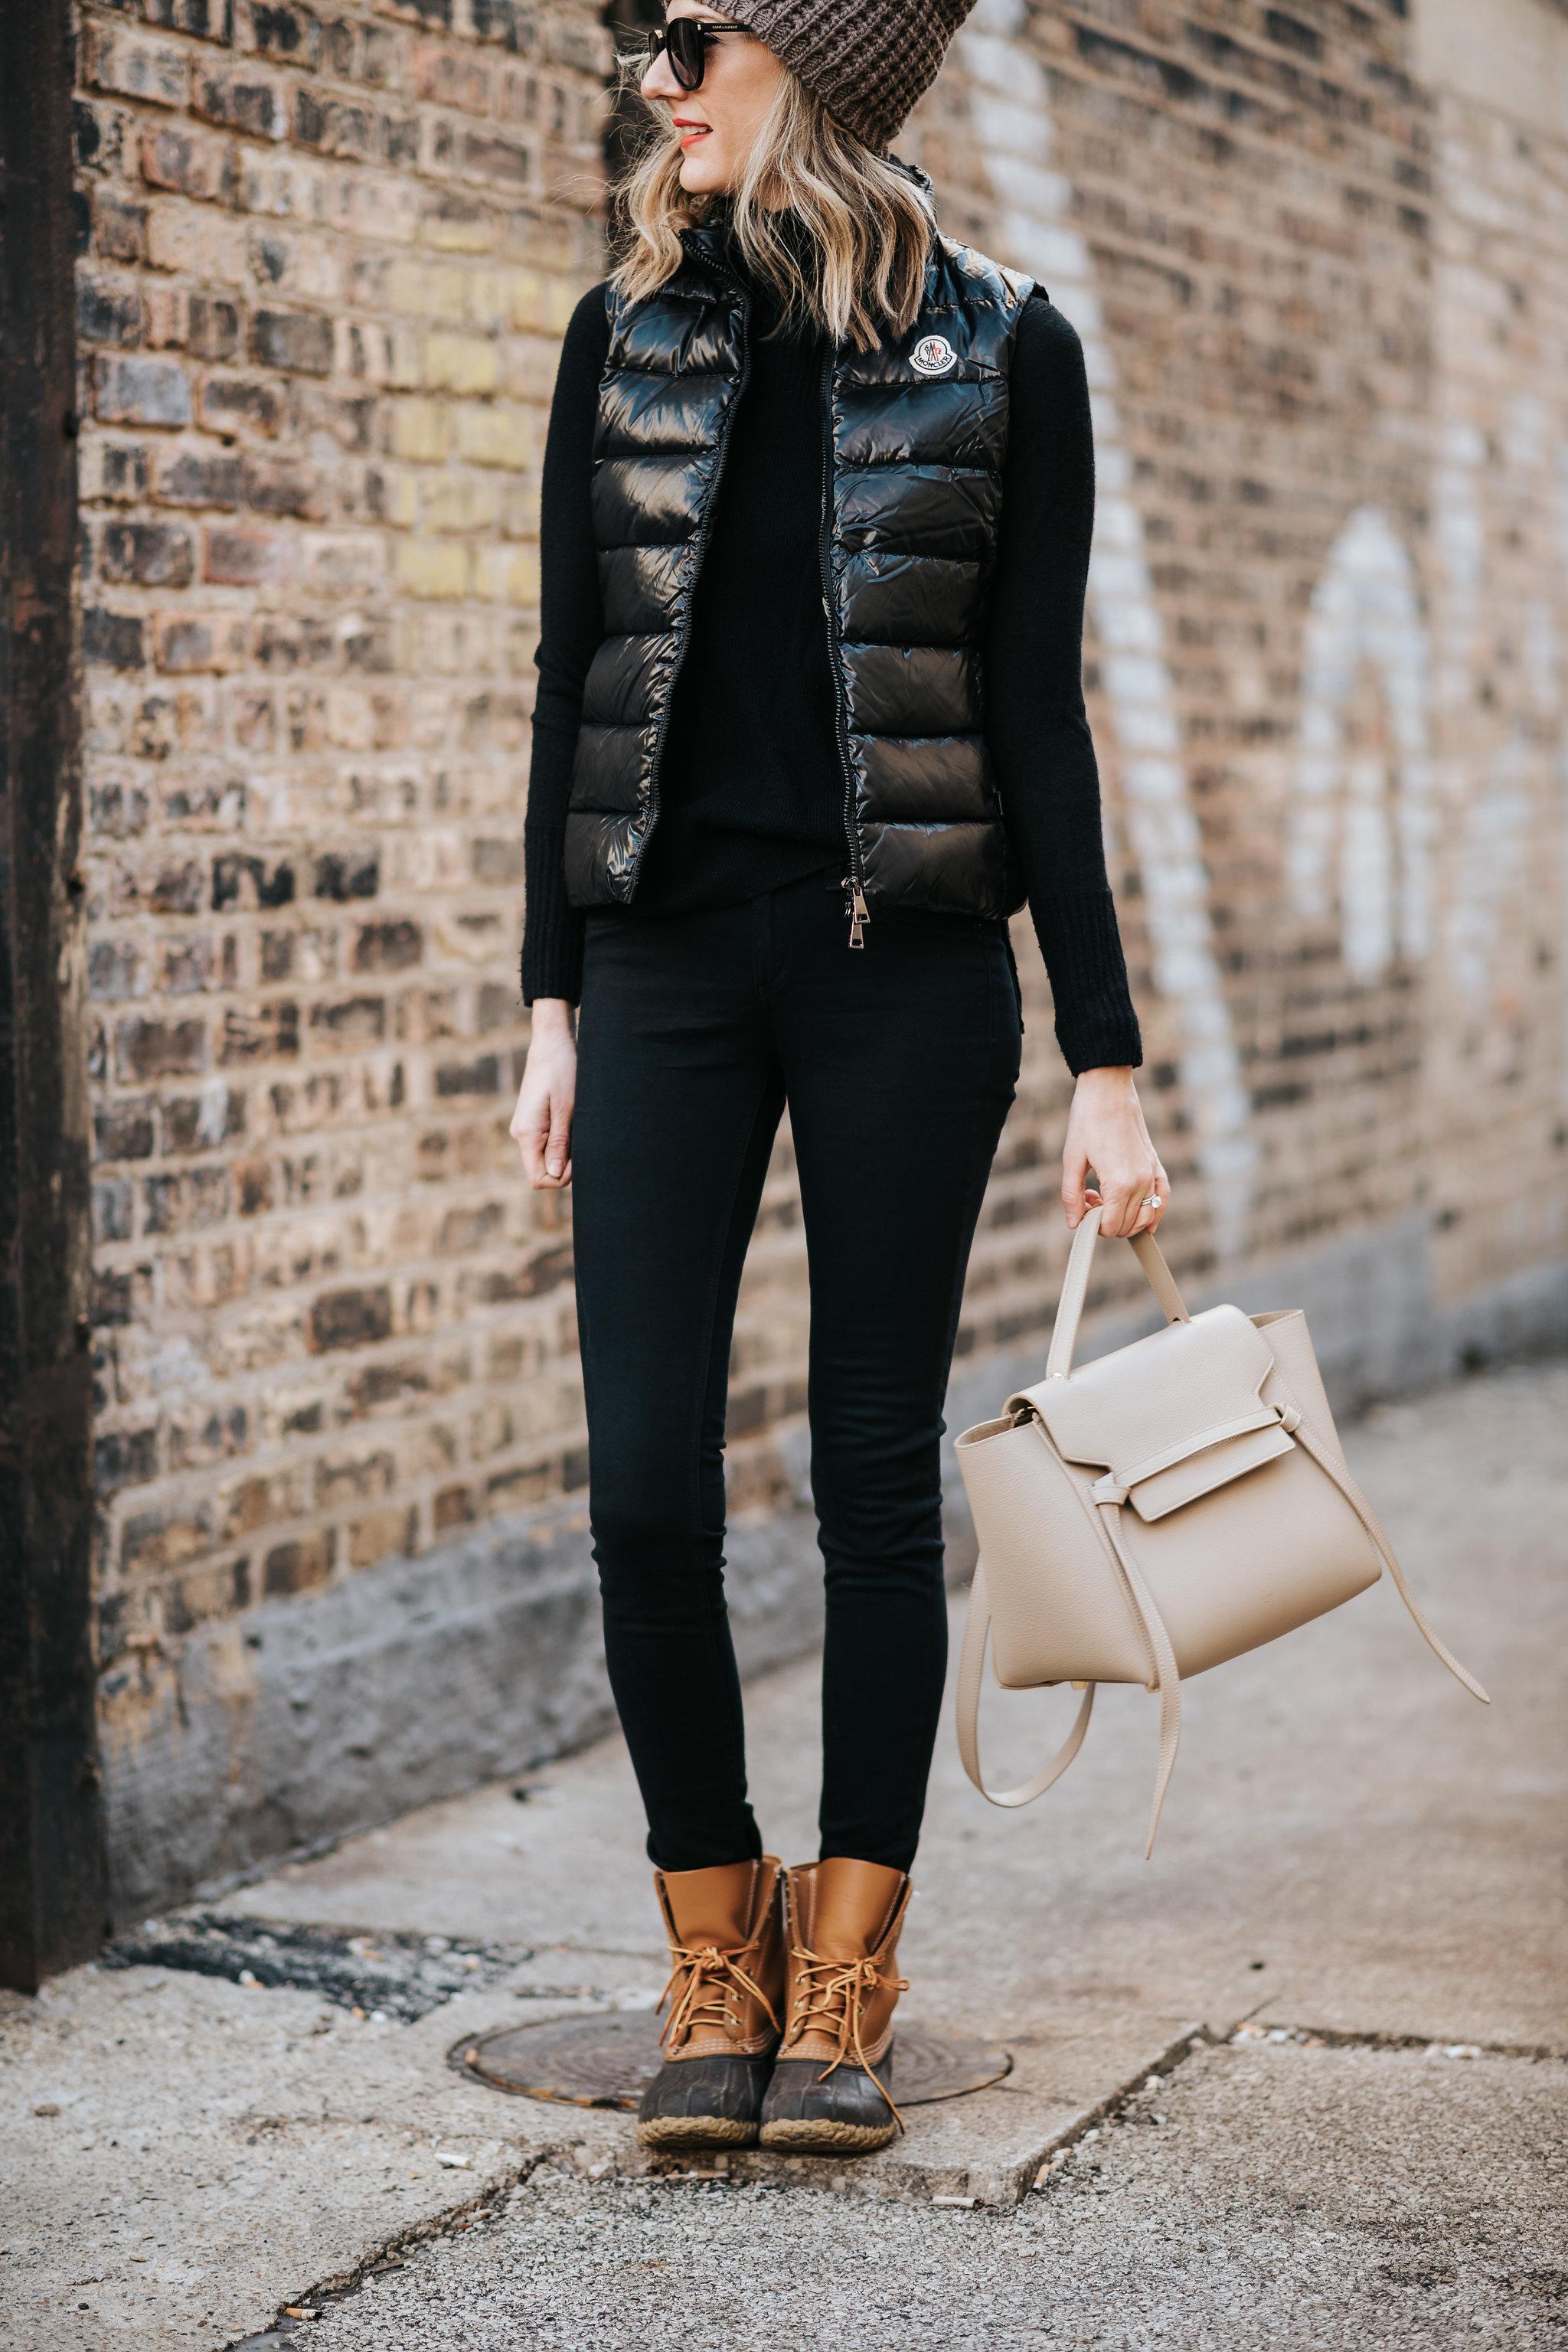 urban chic moncler weekend uniform winter